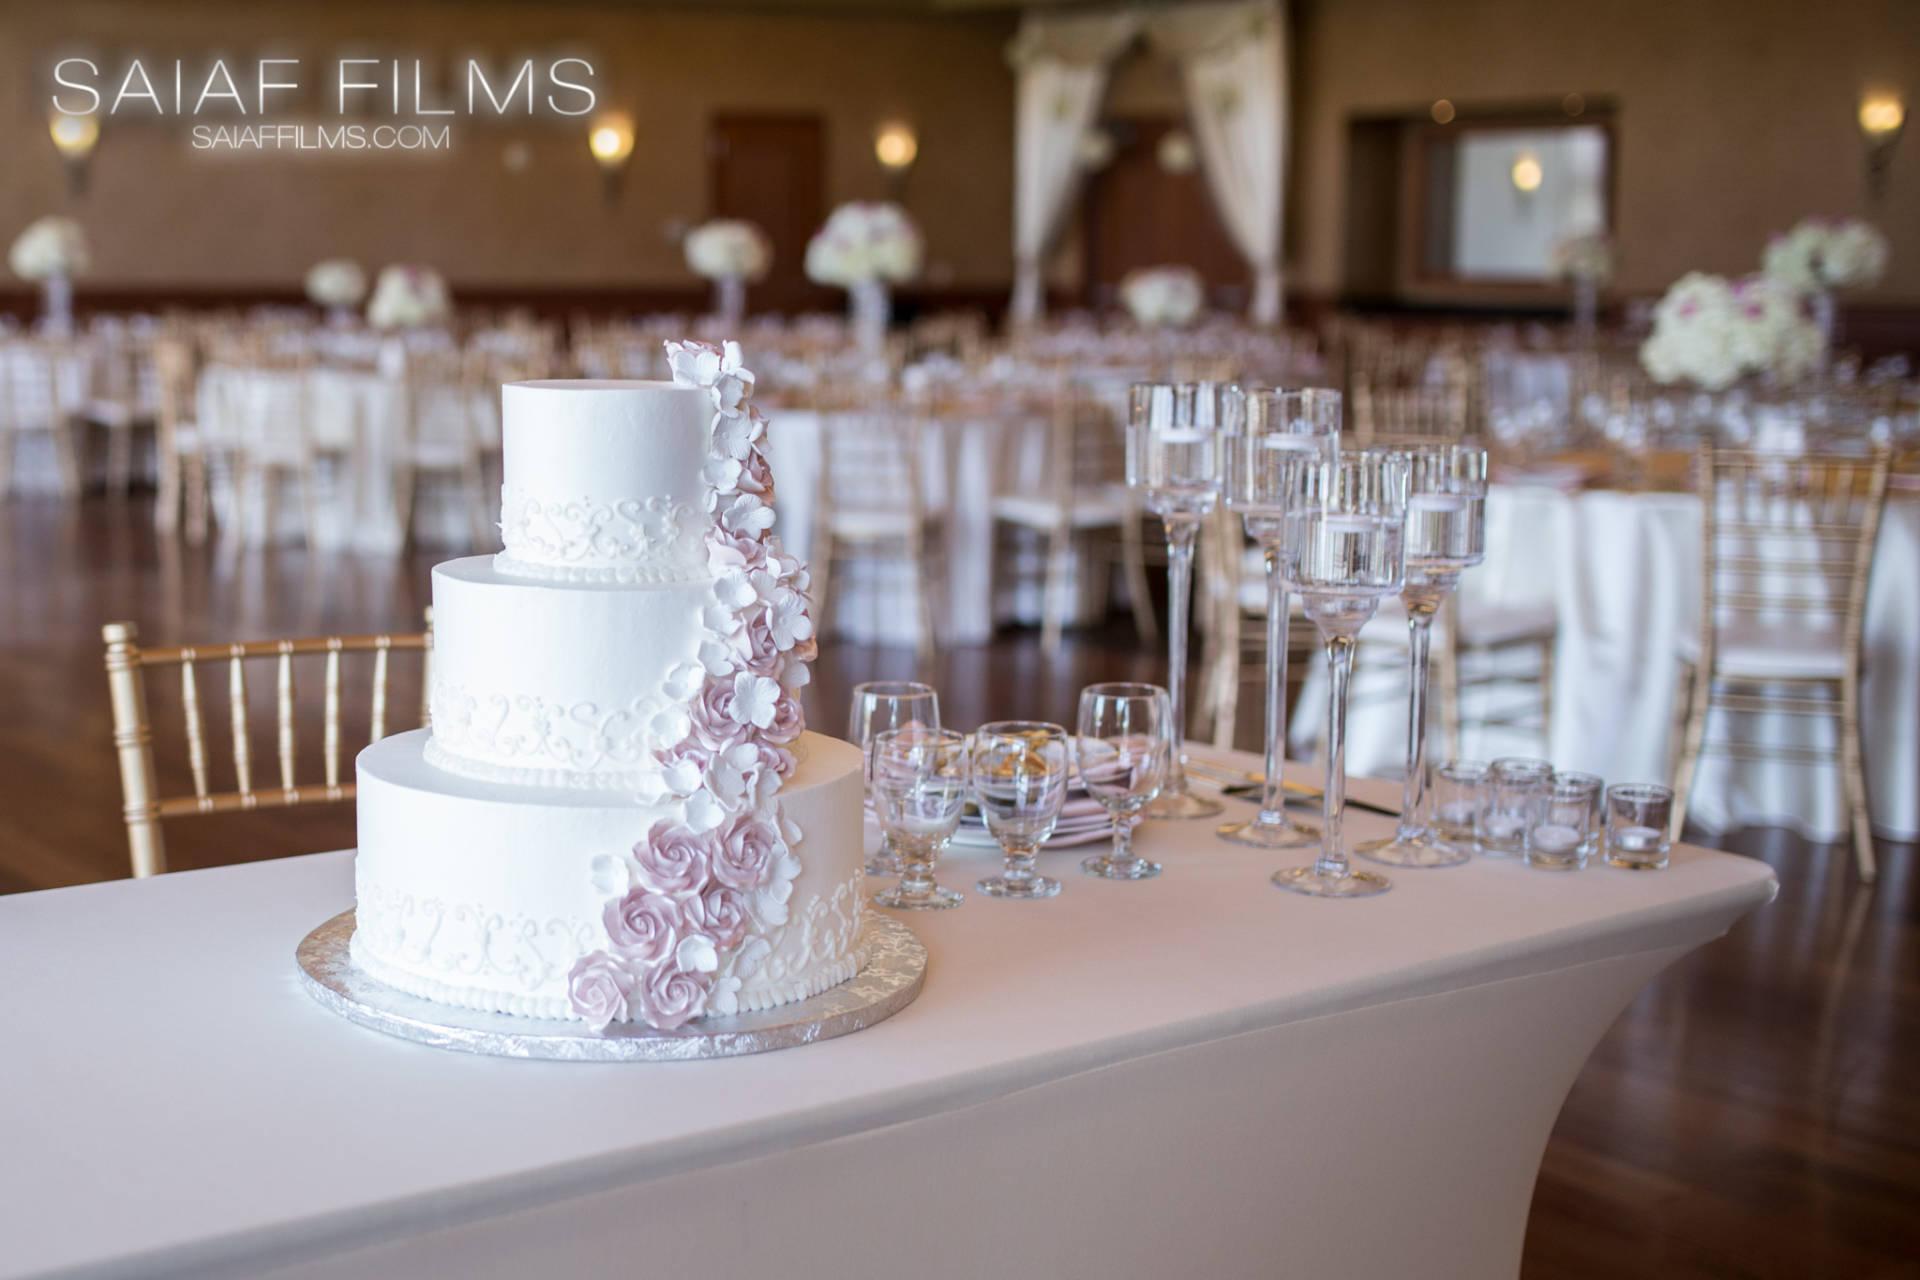 Should You Tip The Wedding Vendors